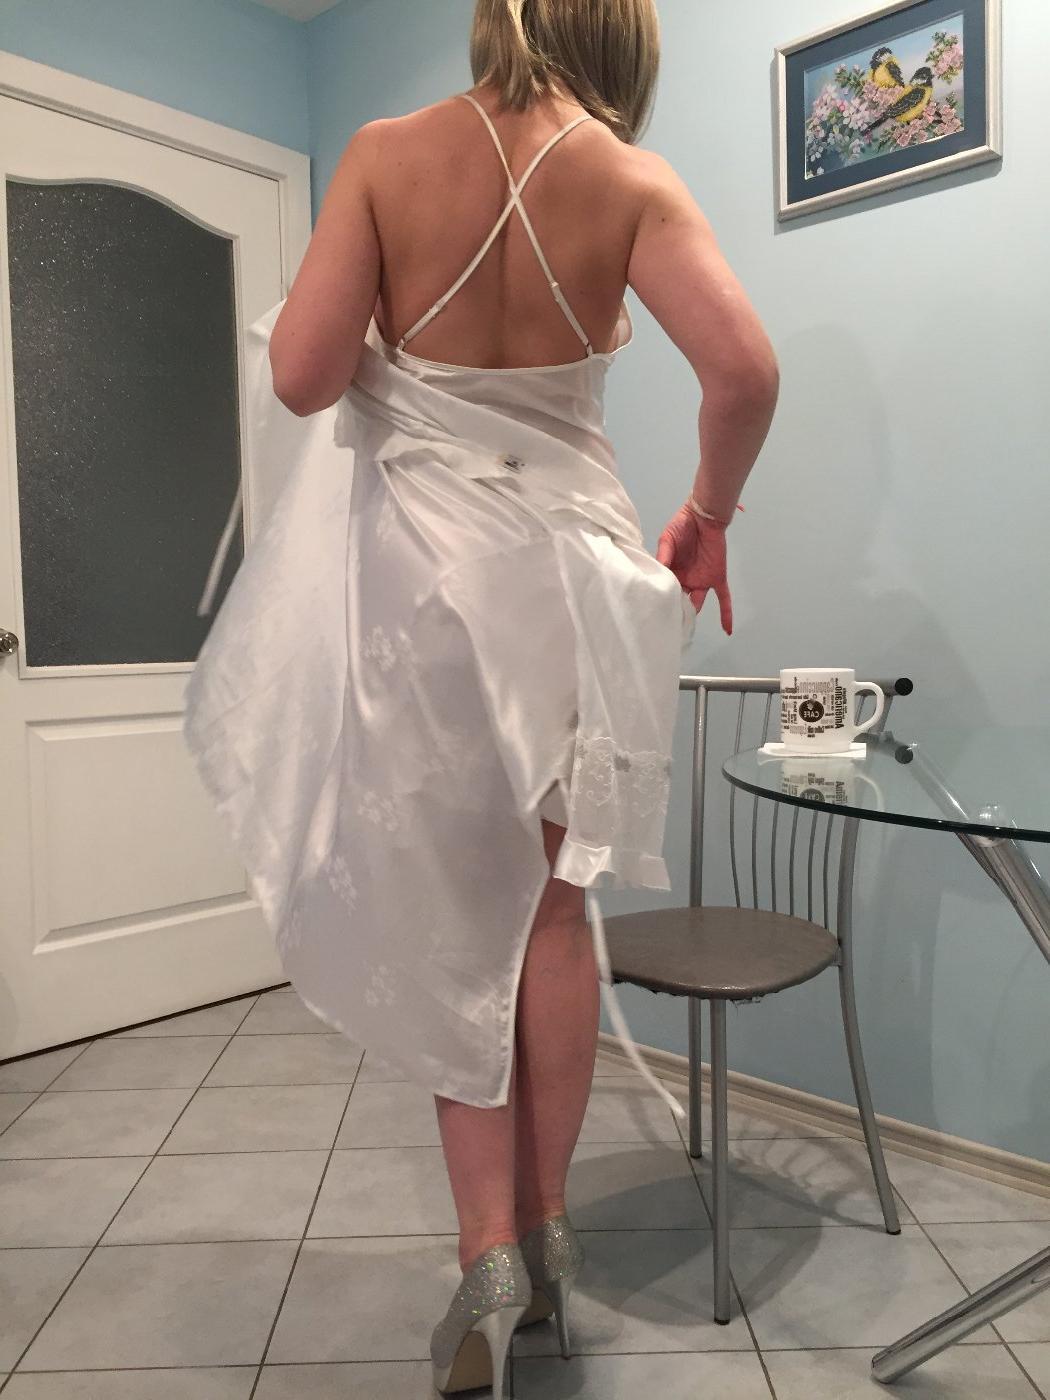 Путана ИЗЯЩНАЯ, 31 год, метро Павелецкая